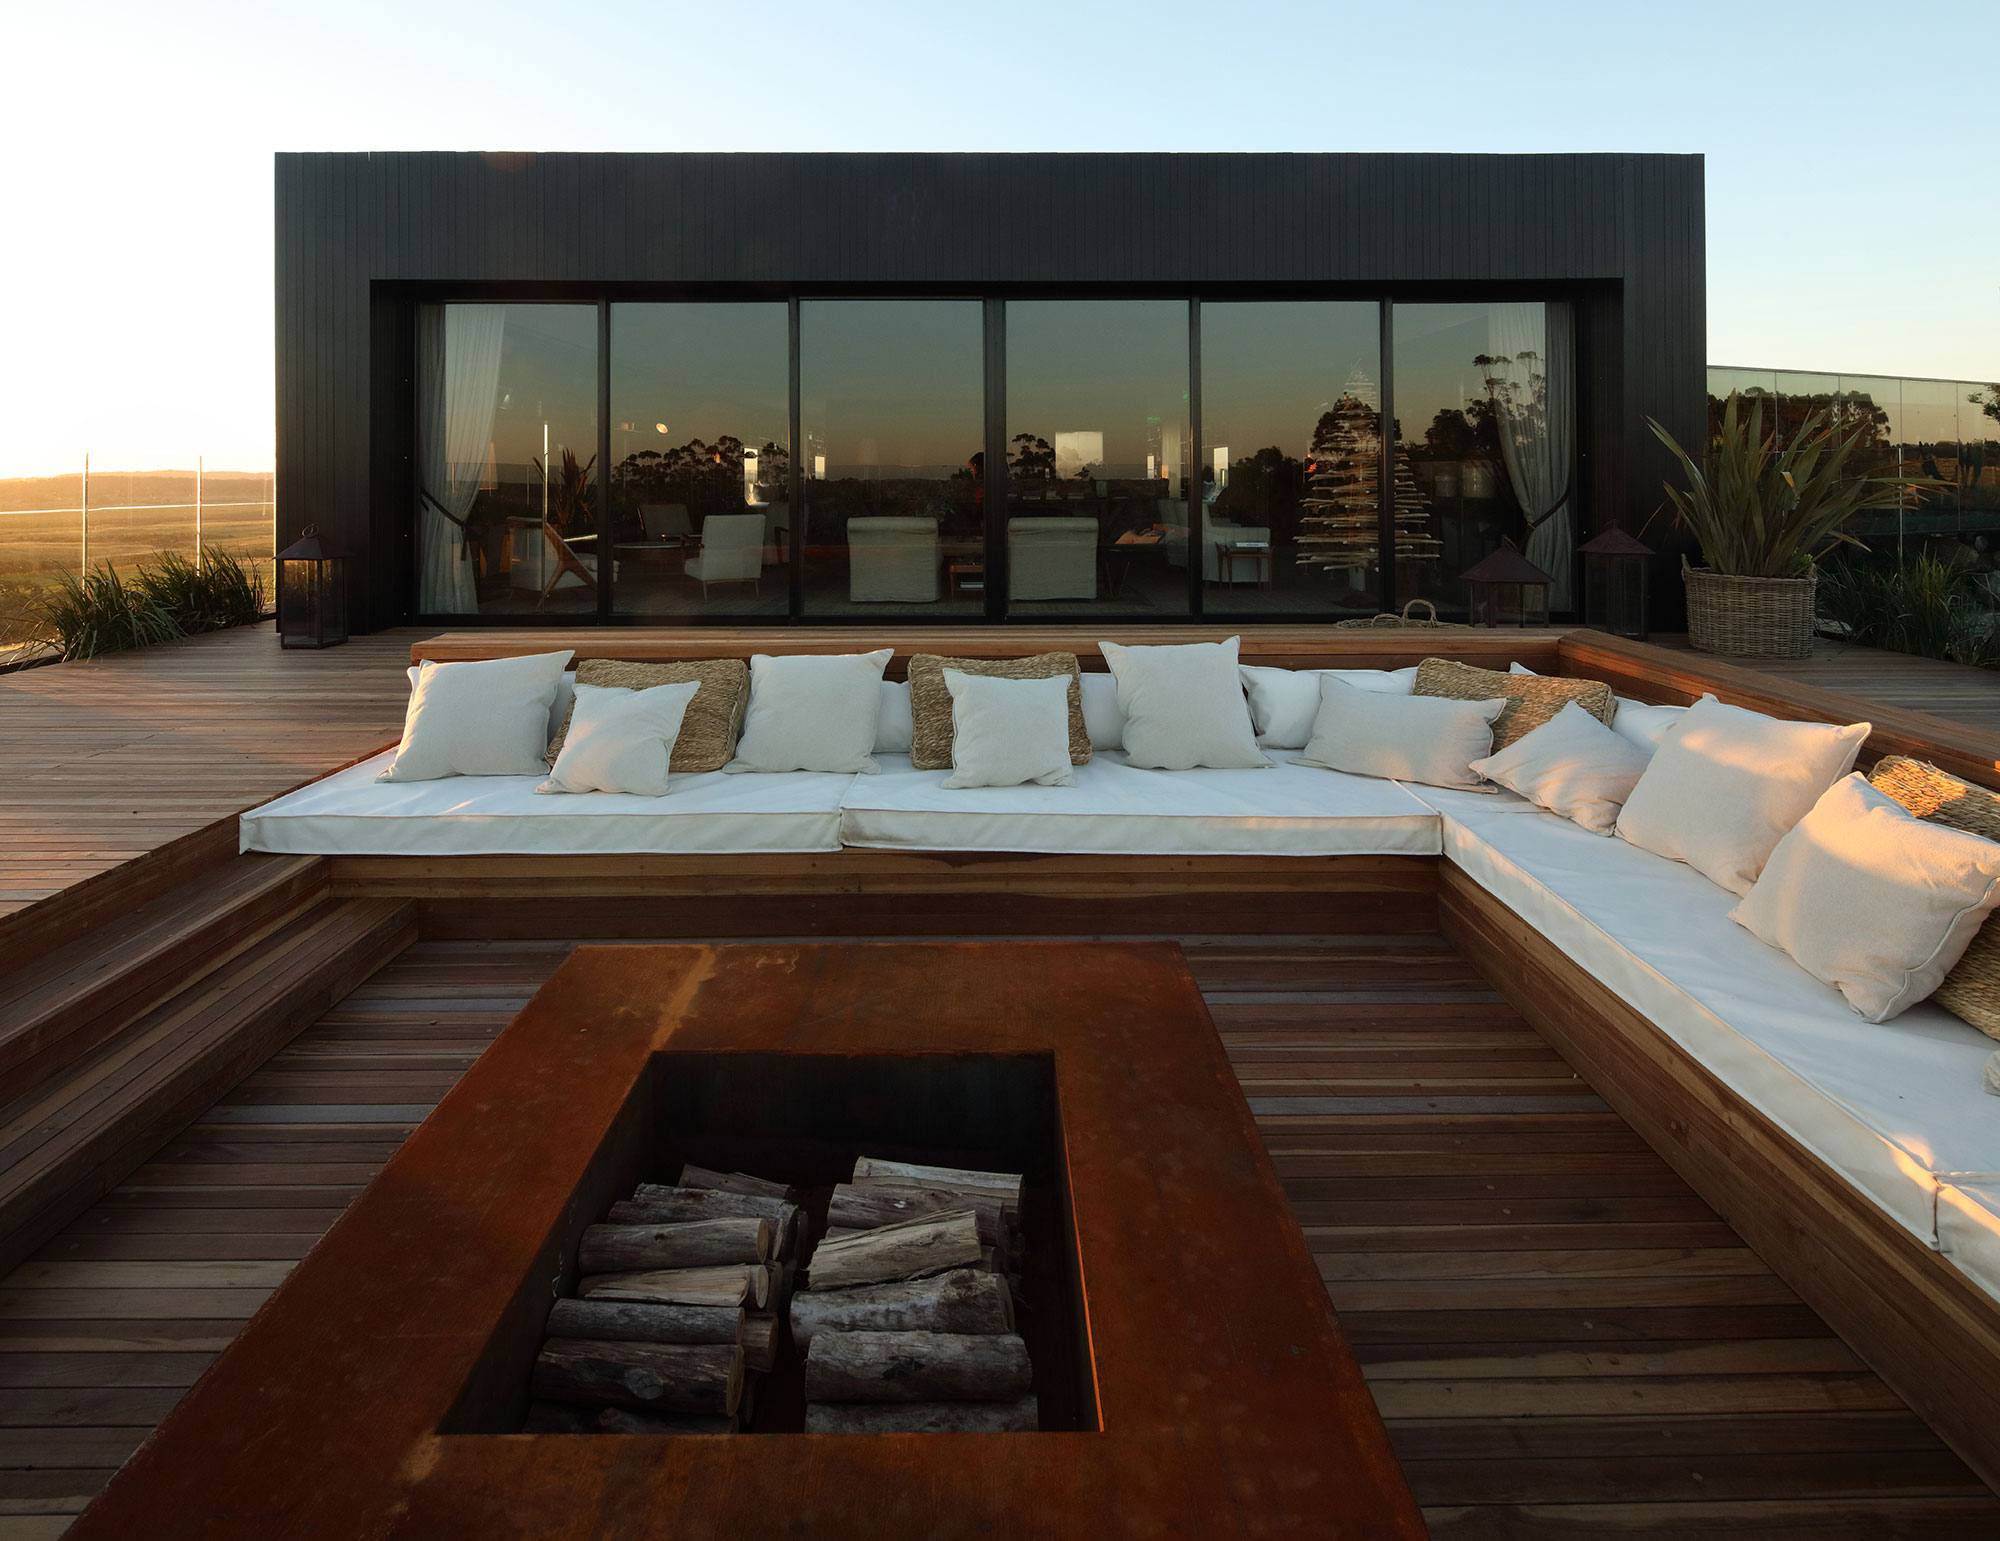 locanda fasano punta del este Carolina Proto Fernanda Schuch Juliana Bassani Lamachia arquitetura hotel